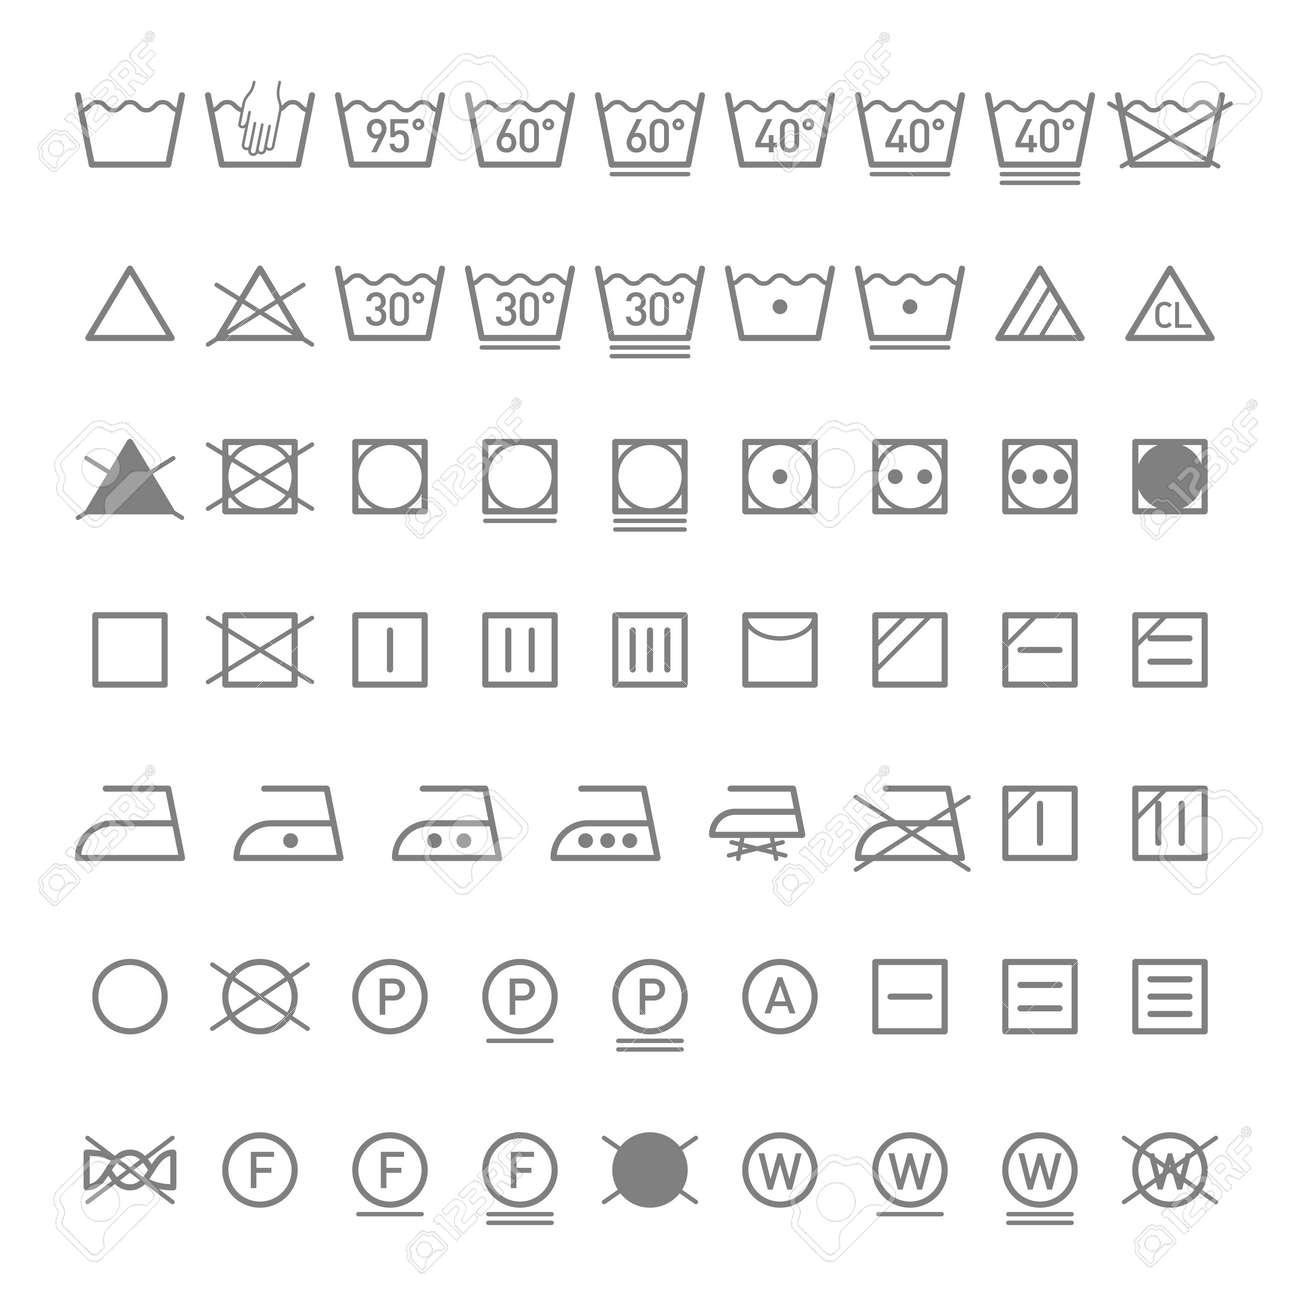 Laundry symbols royalty free cliparts vectors and stock laundry symbols stock vector 17494516 buycottarizona